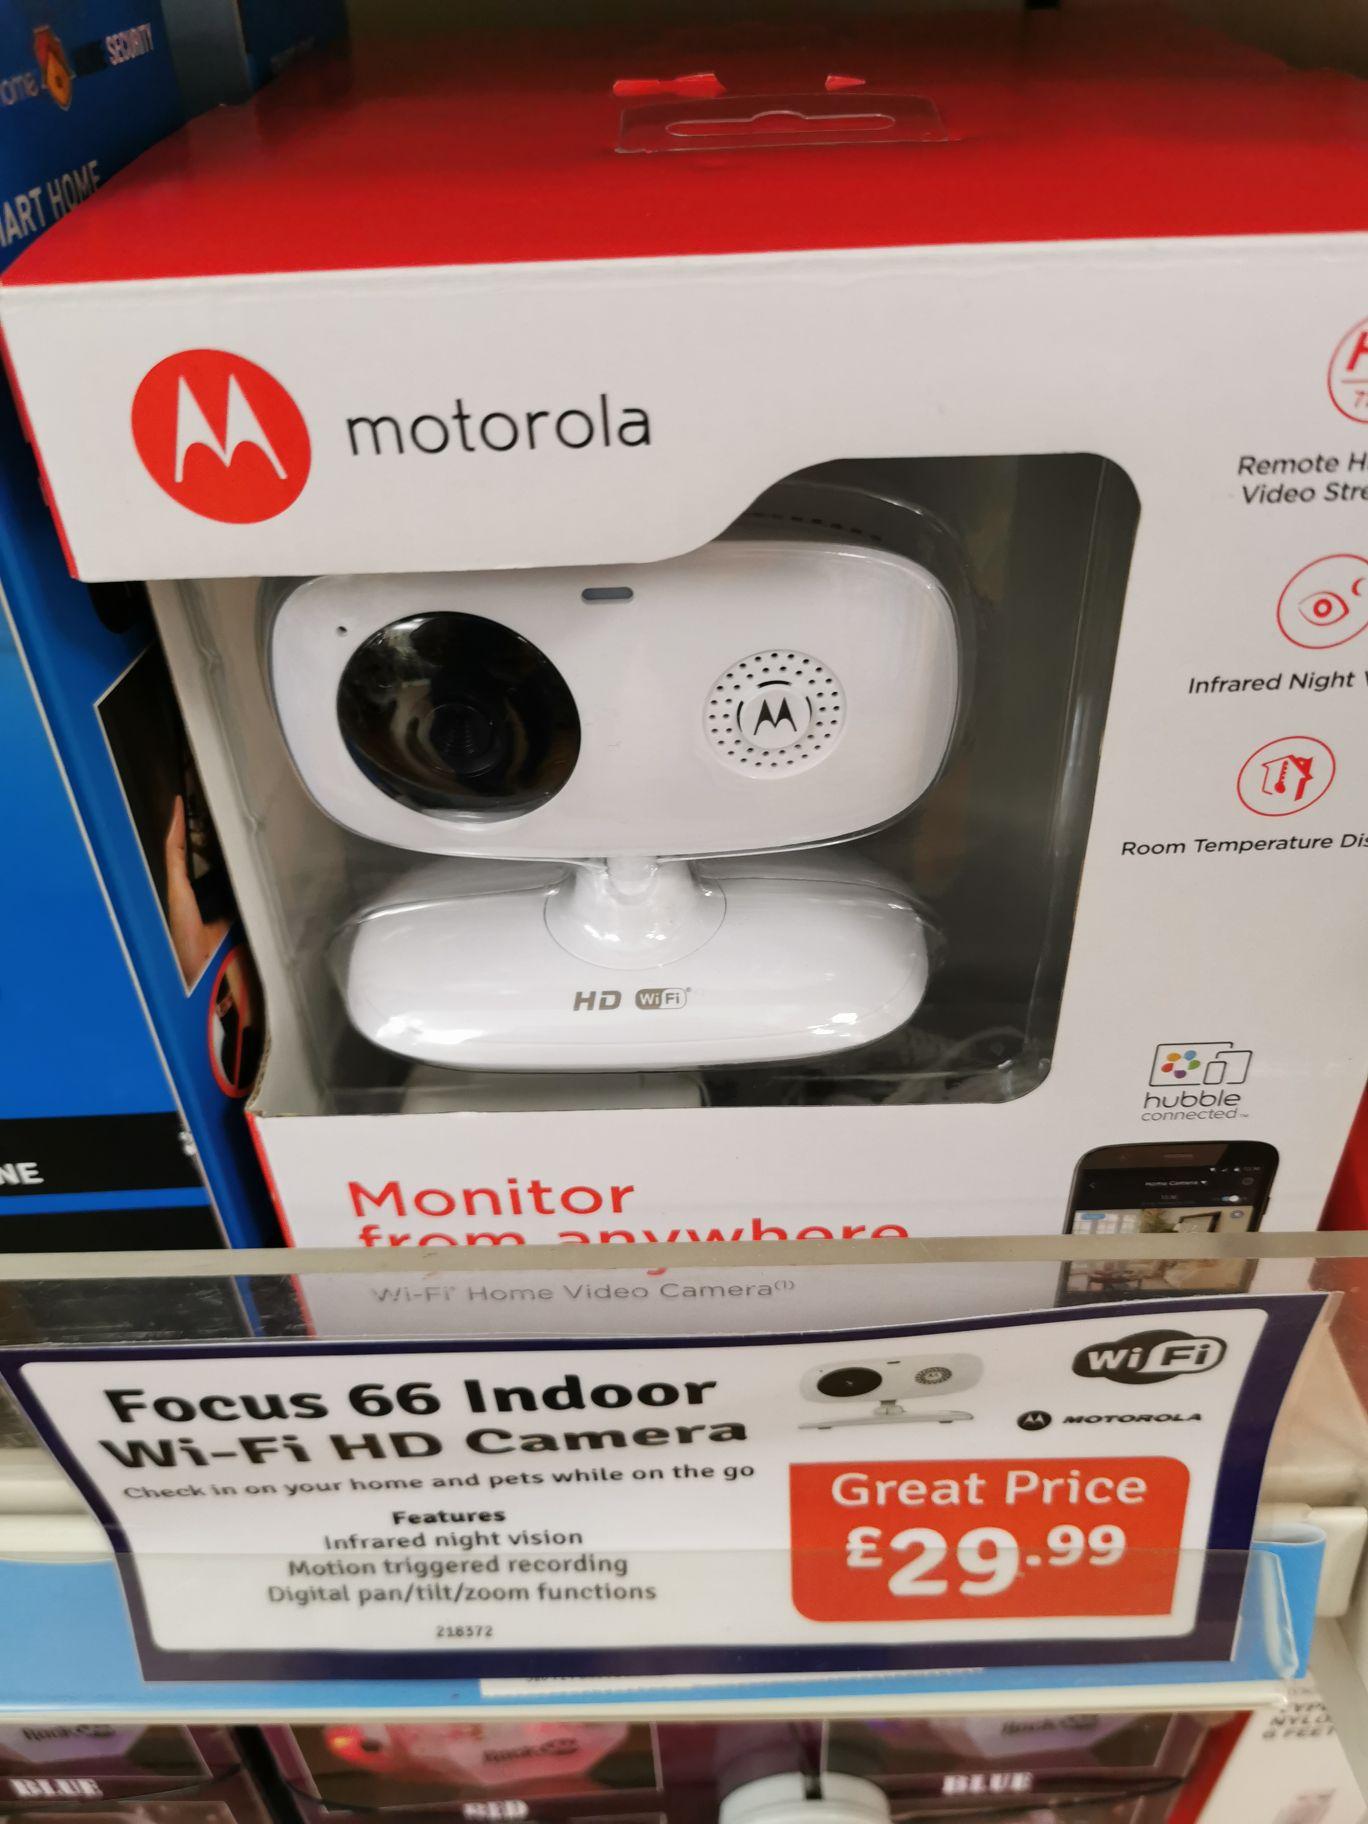 Motorola focus 66 indoor WiFi camera £29.99 instore @ The Range